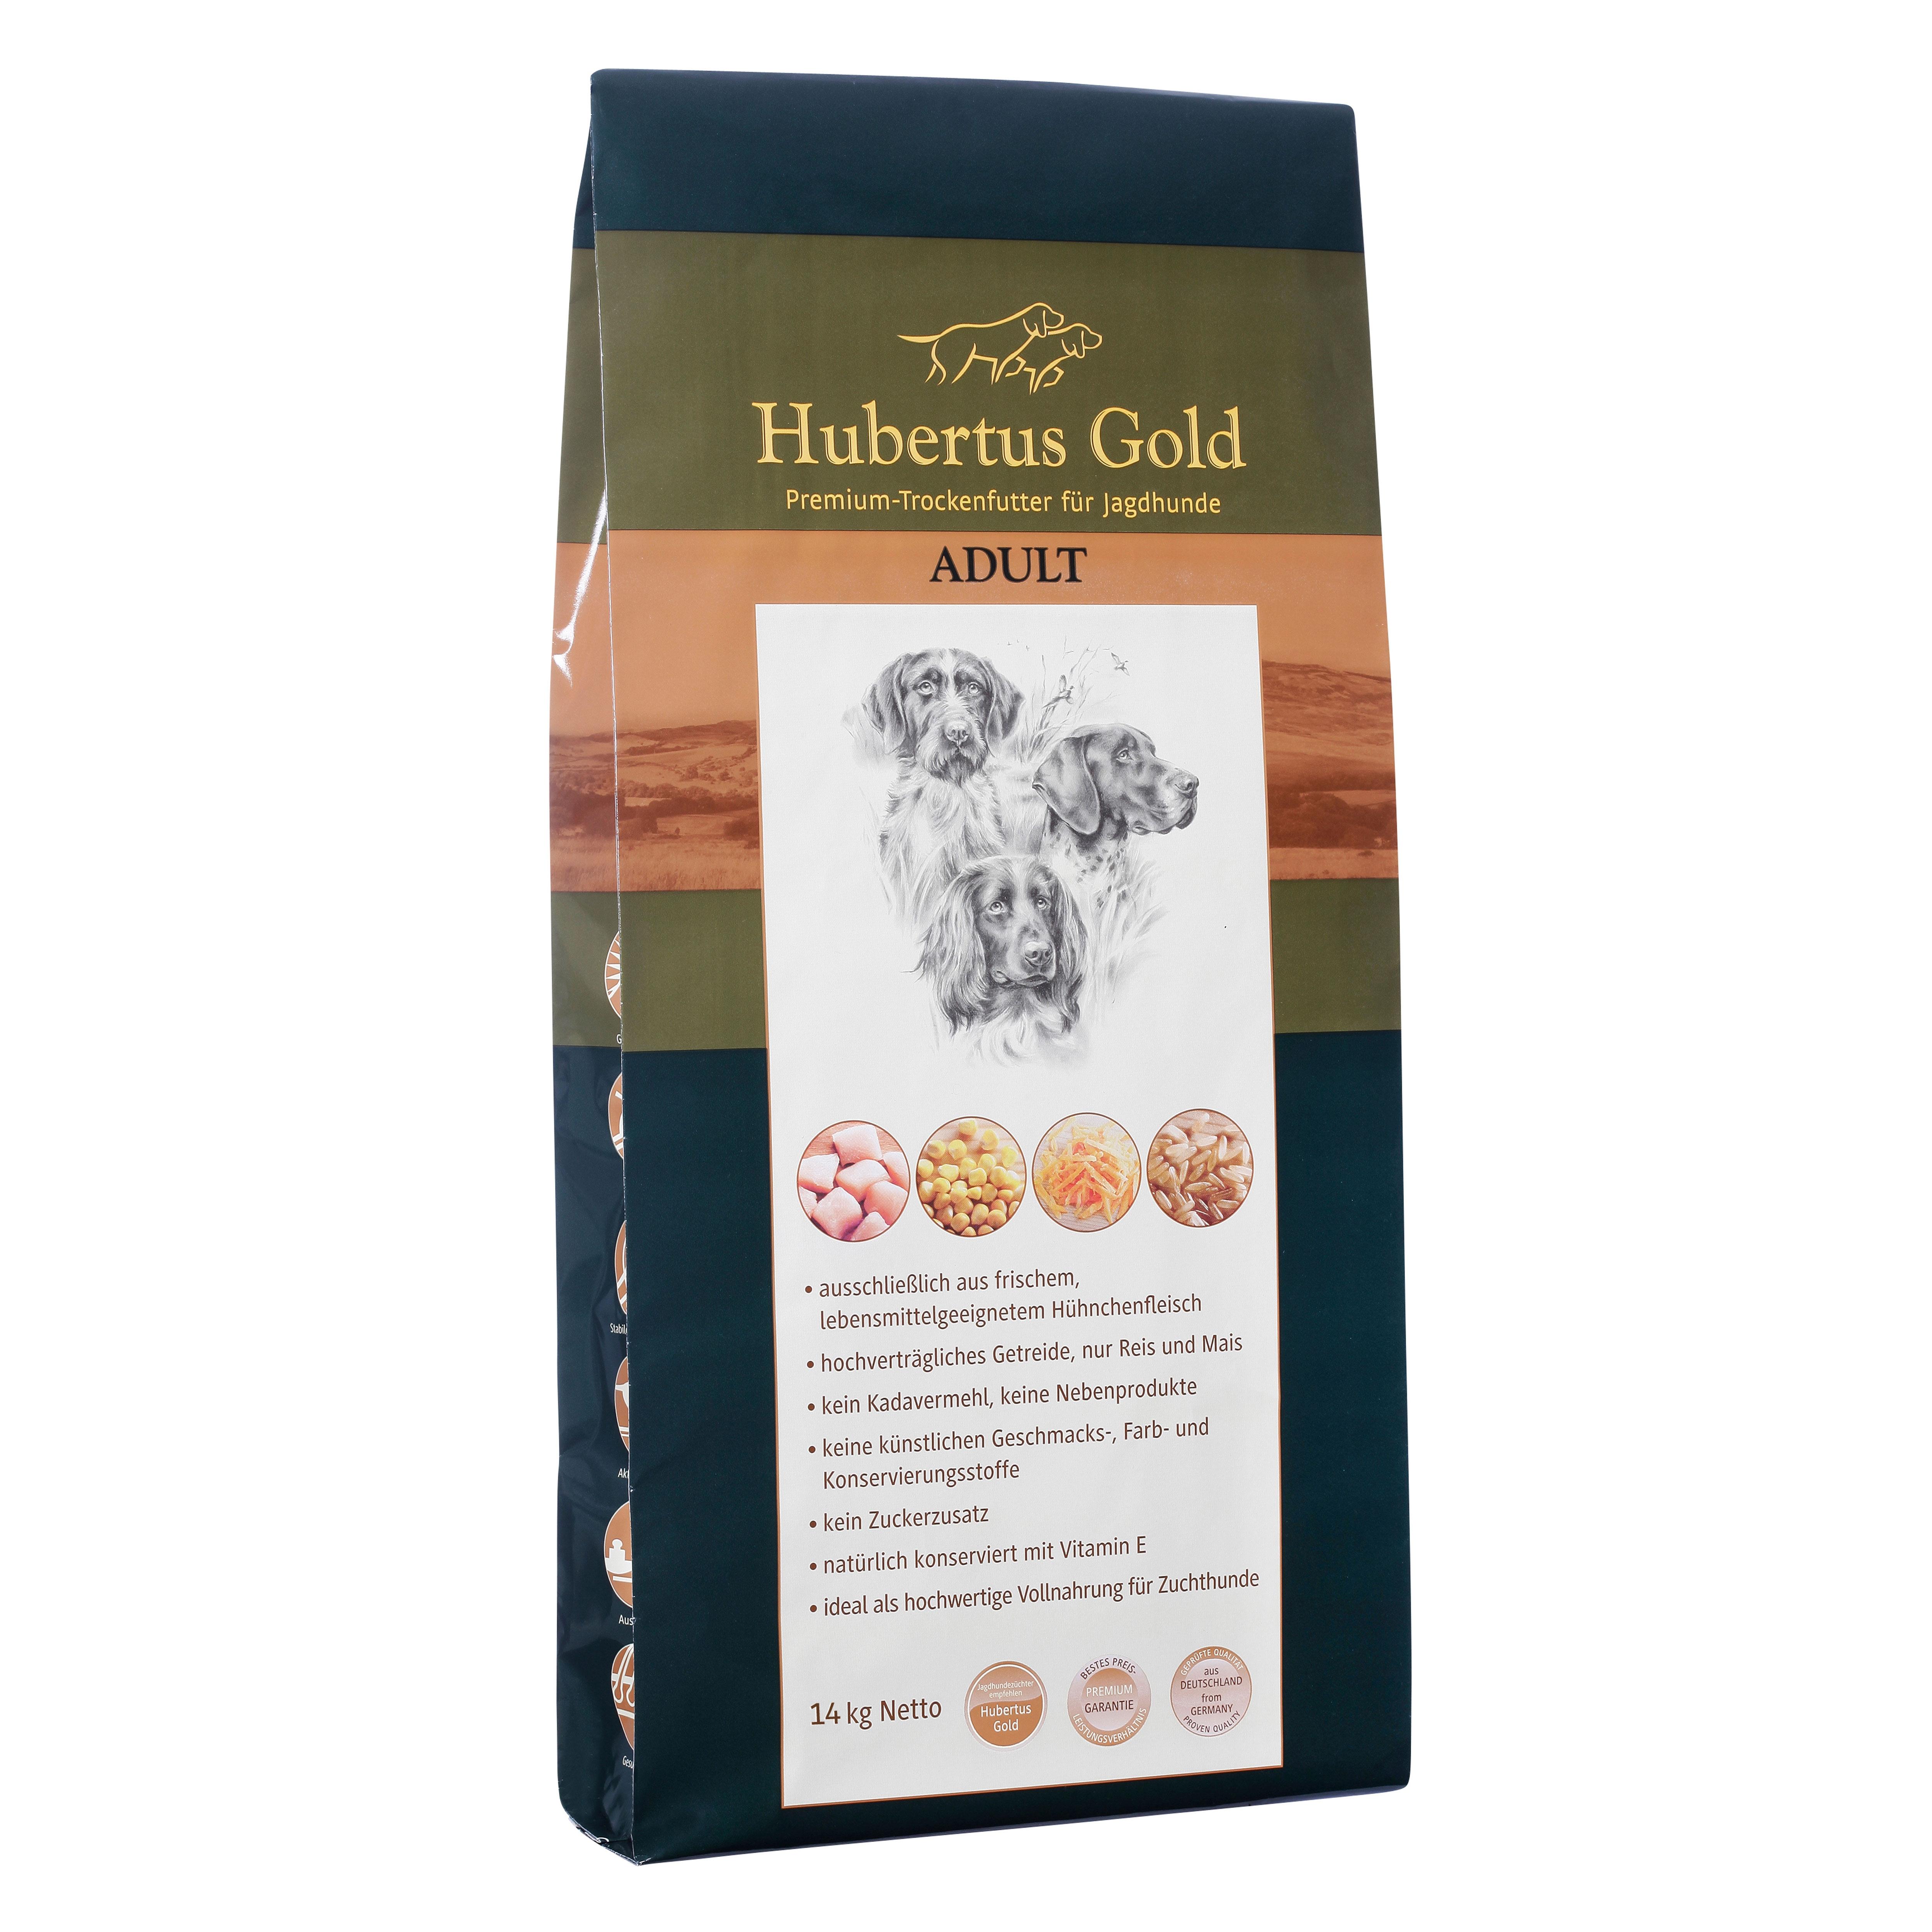 Hubertus Gold Droogvoeding